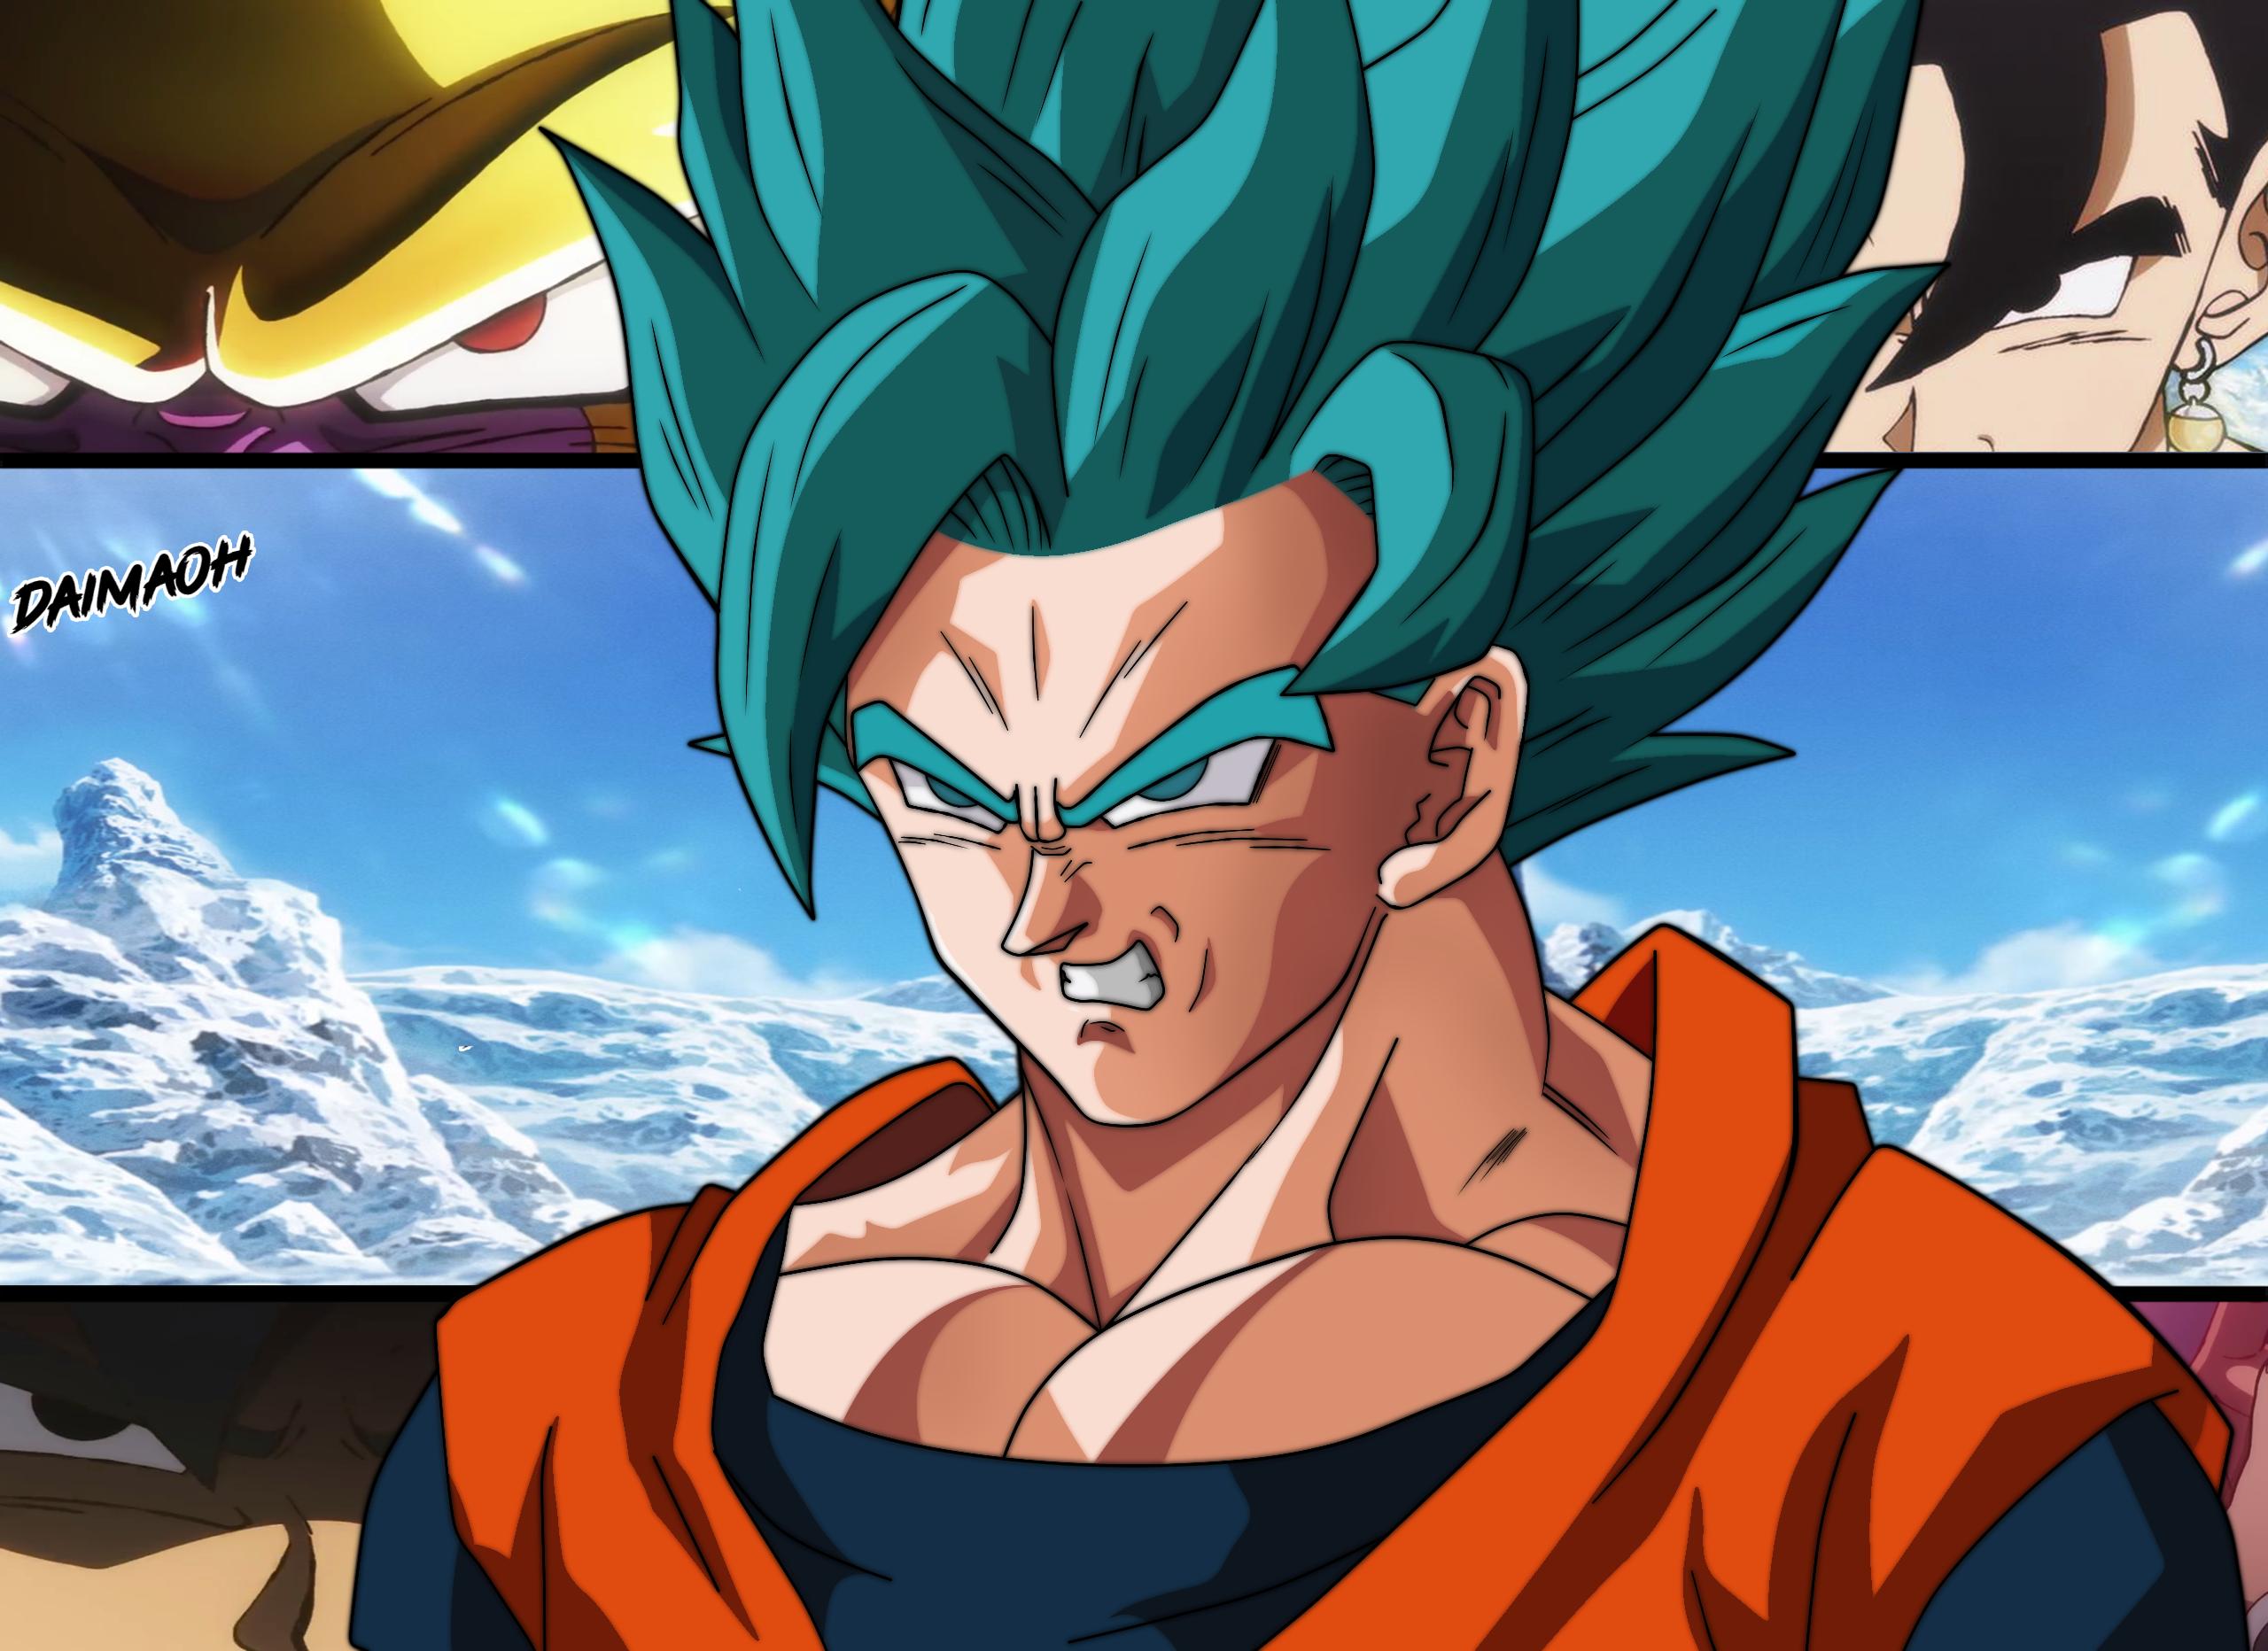 Goku Super Saiyan Blue 2 Wallpaper By Daimaoha5a4 On Deviantart